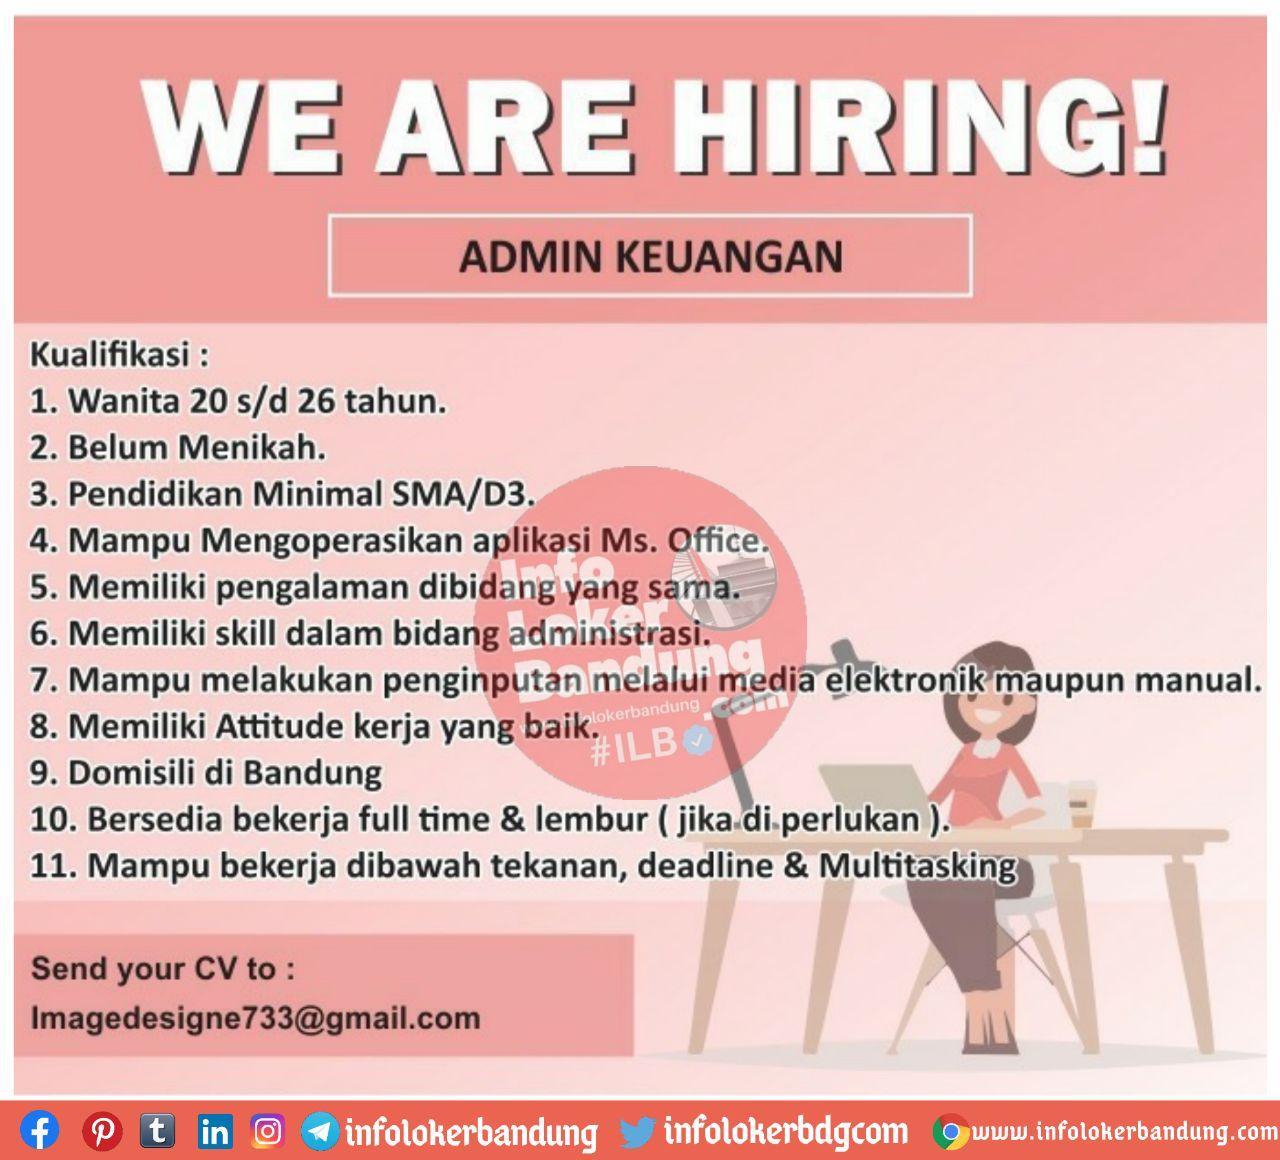 Lowongan Kerja Image Design Bandung November 2020